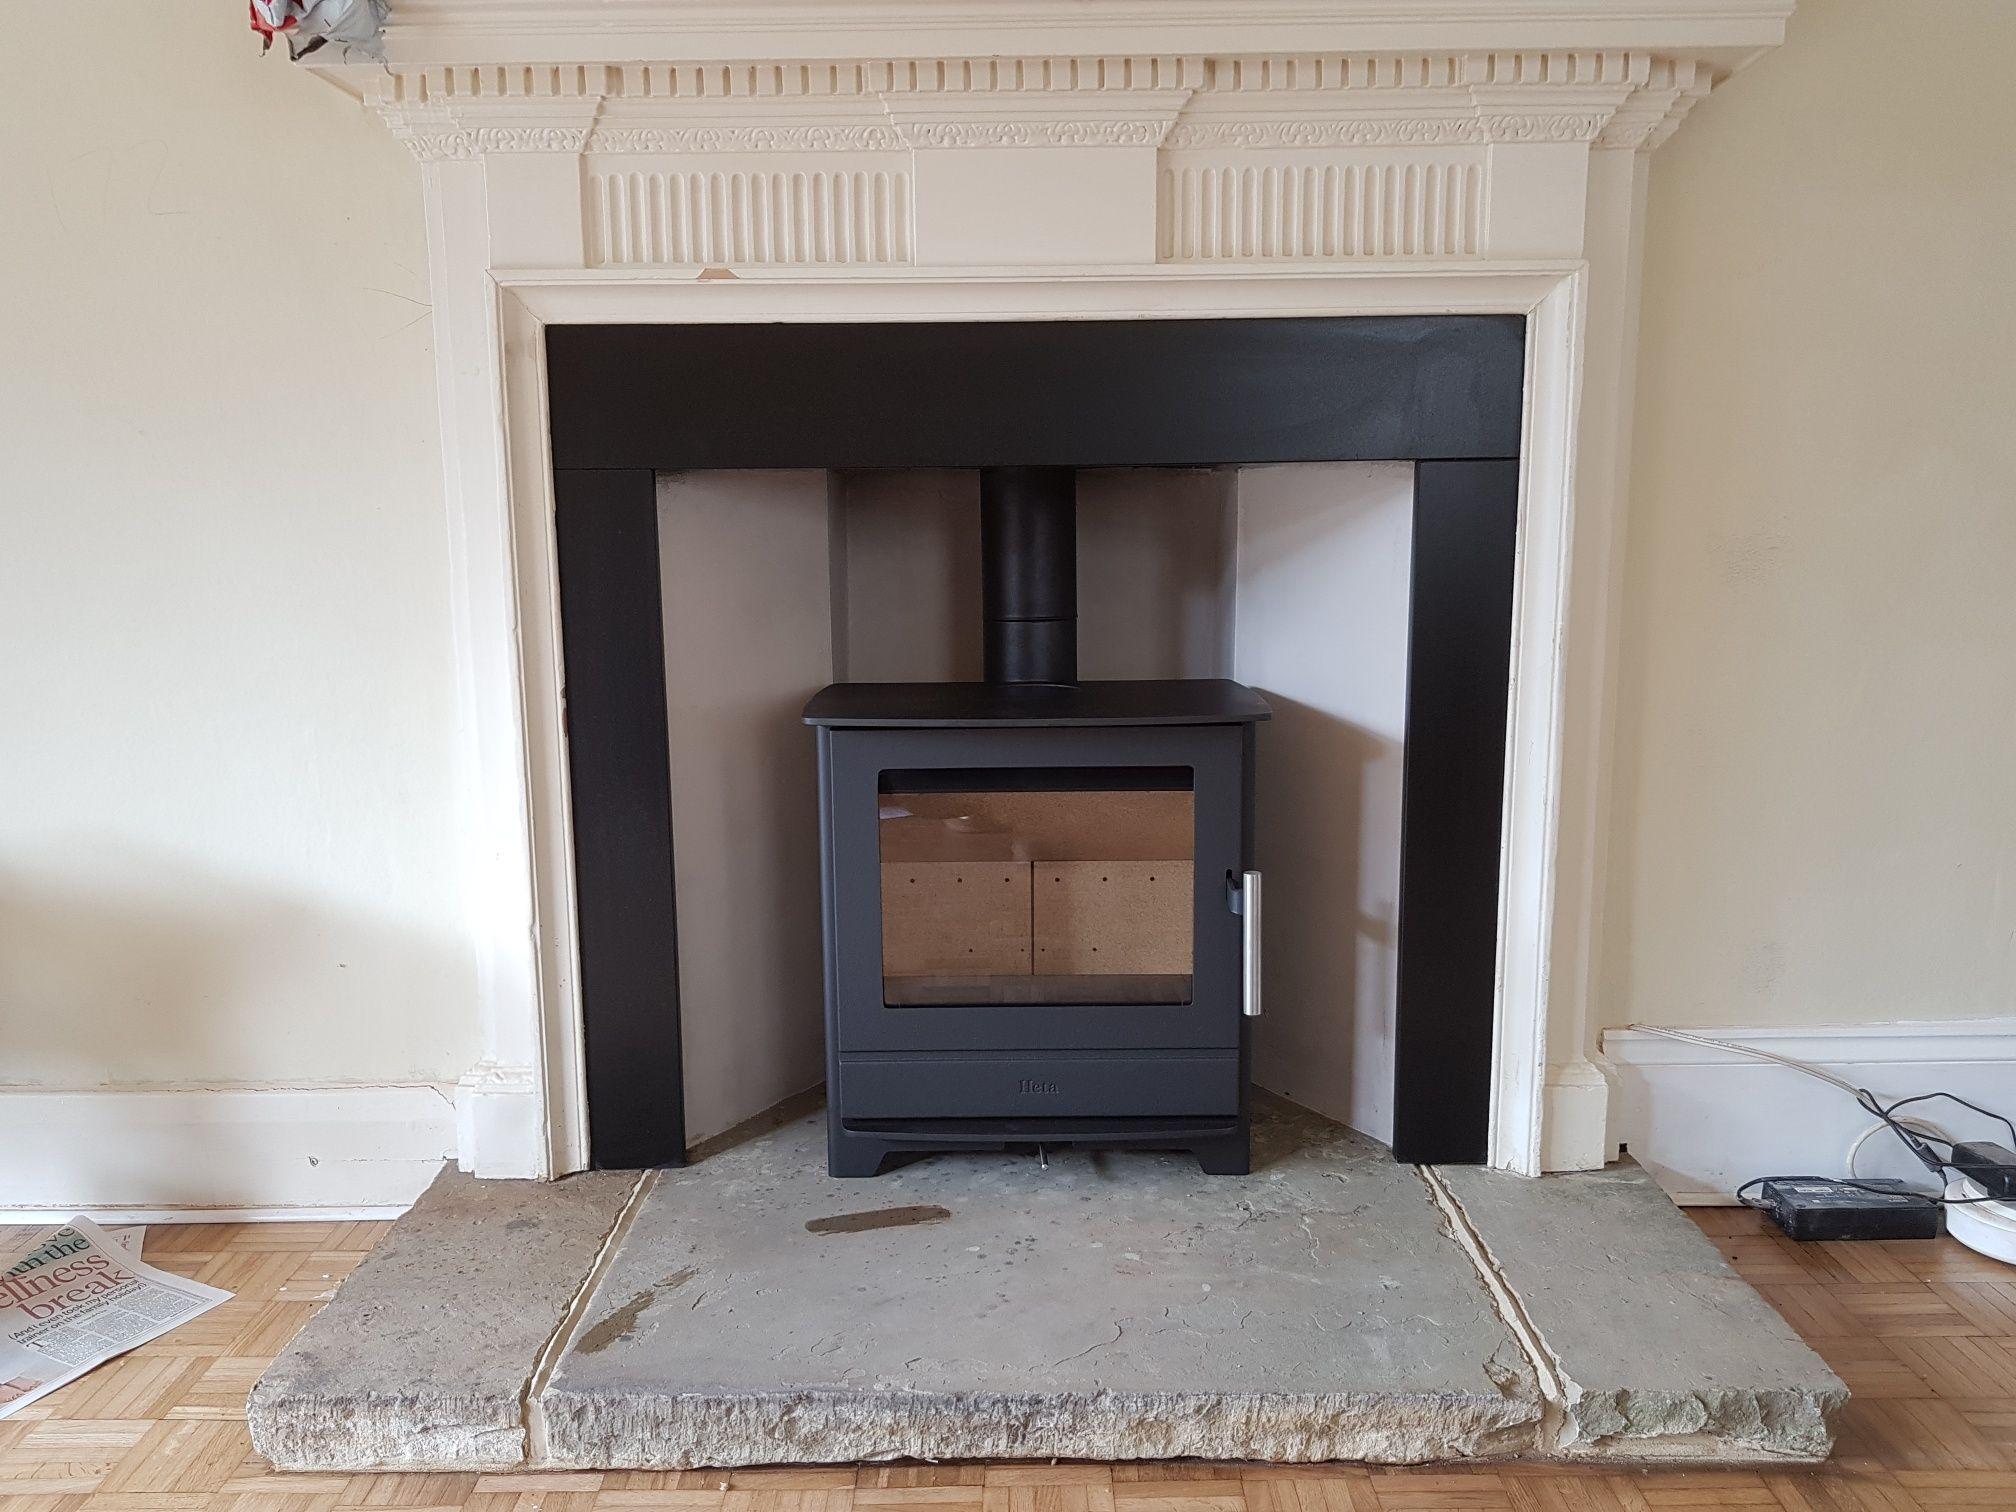 Heta Inspire 45 With Honed Granite Slip Set Client S Own Surround And Hearth Granite Hearth Wood Burning Stove Honed Granite